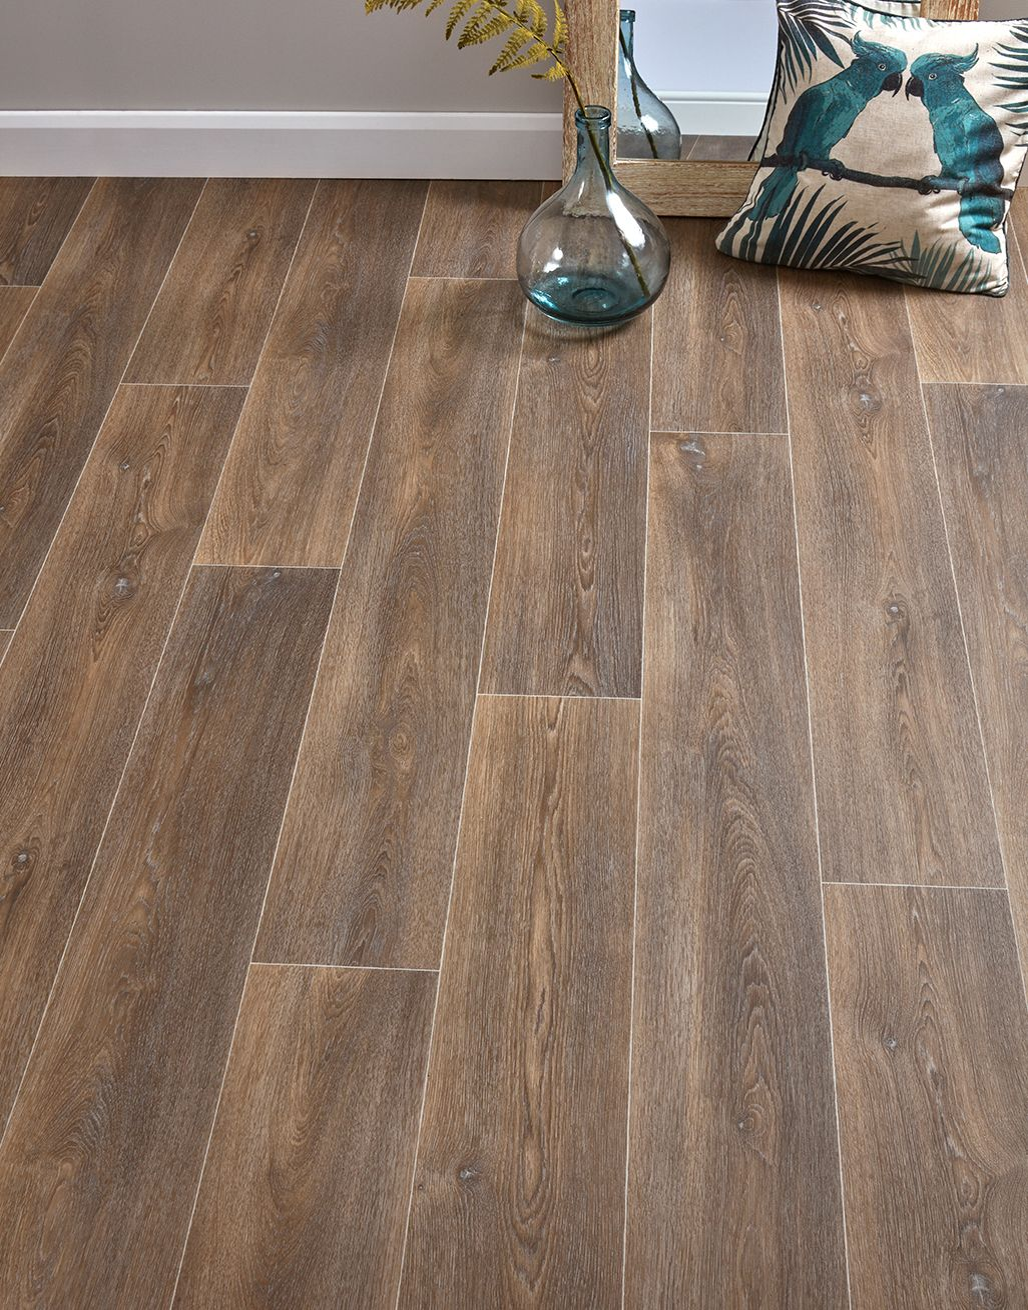 Denver Rustic Oak Flooring Super, Laminate Flooring Denver